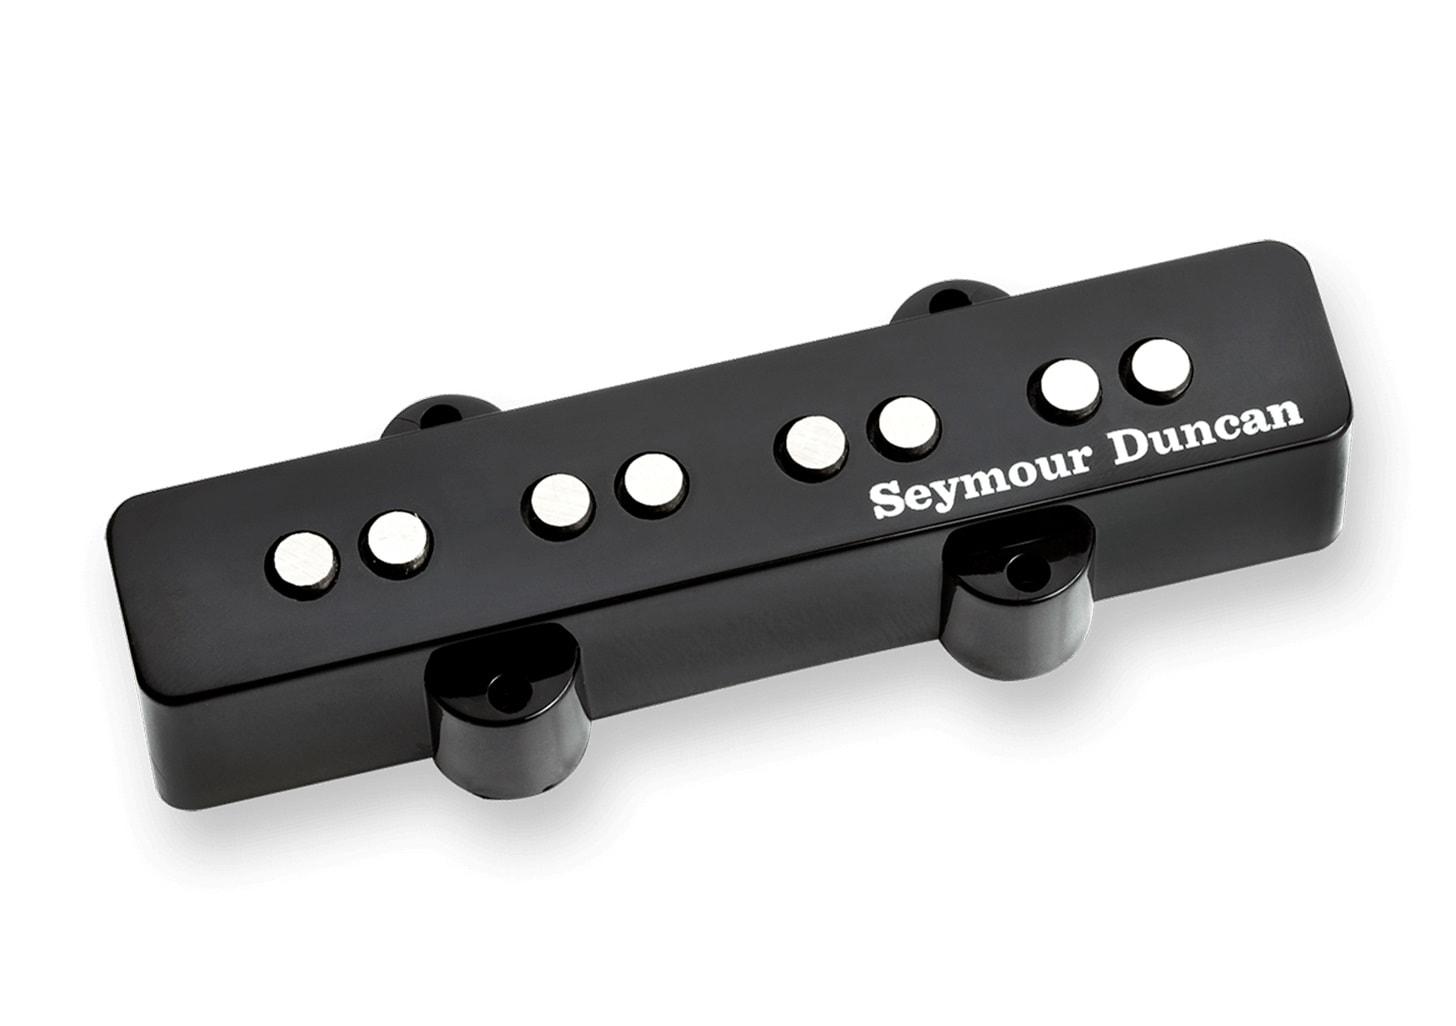 seymour duncan stkj2b hot stack jazz bass bridge pickup black solo guitars. Black Bedroom Furniture Sets. Home Design Ideas